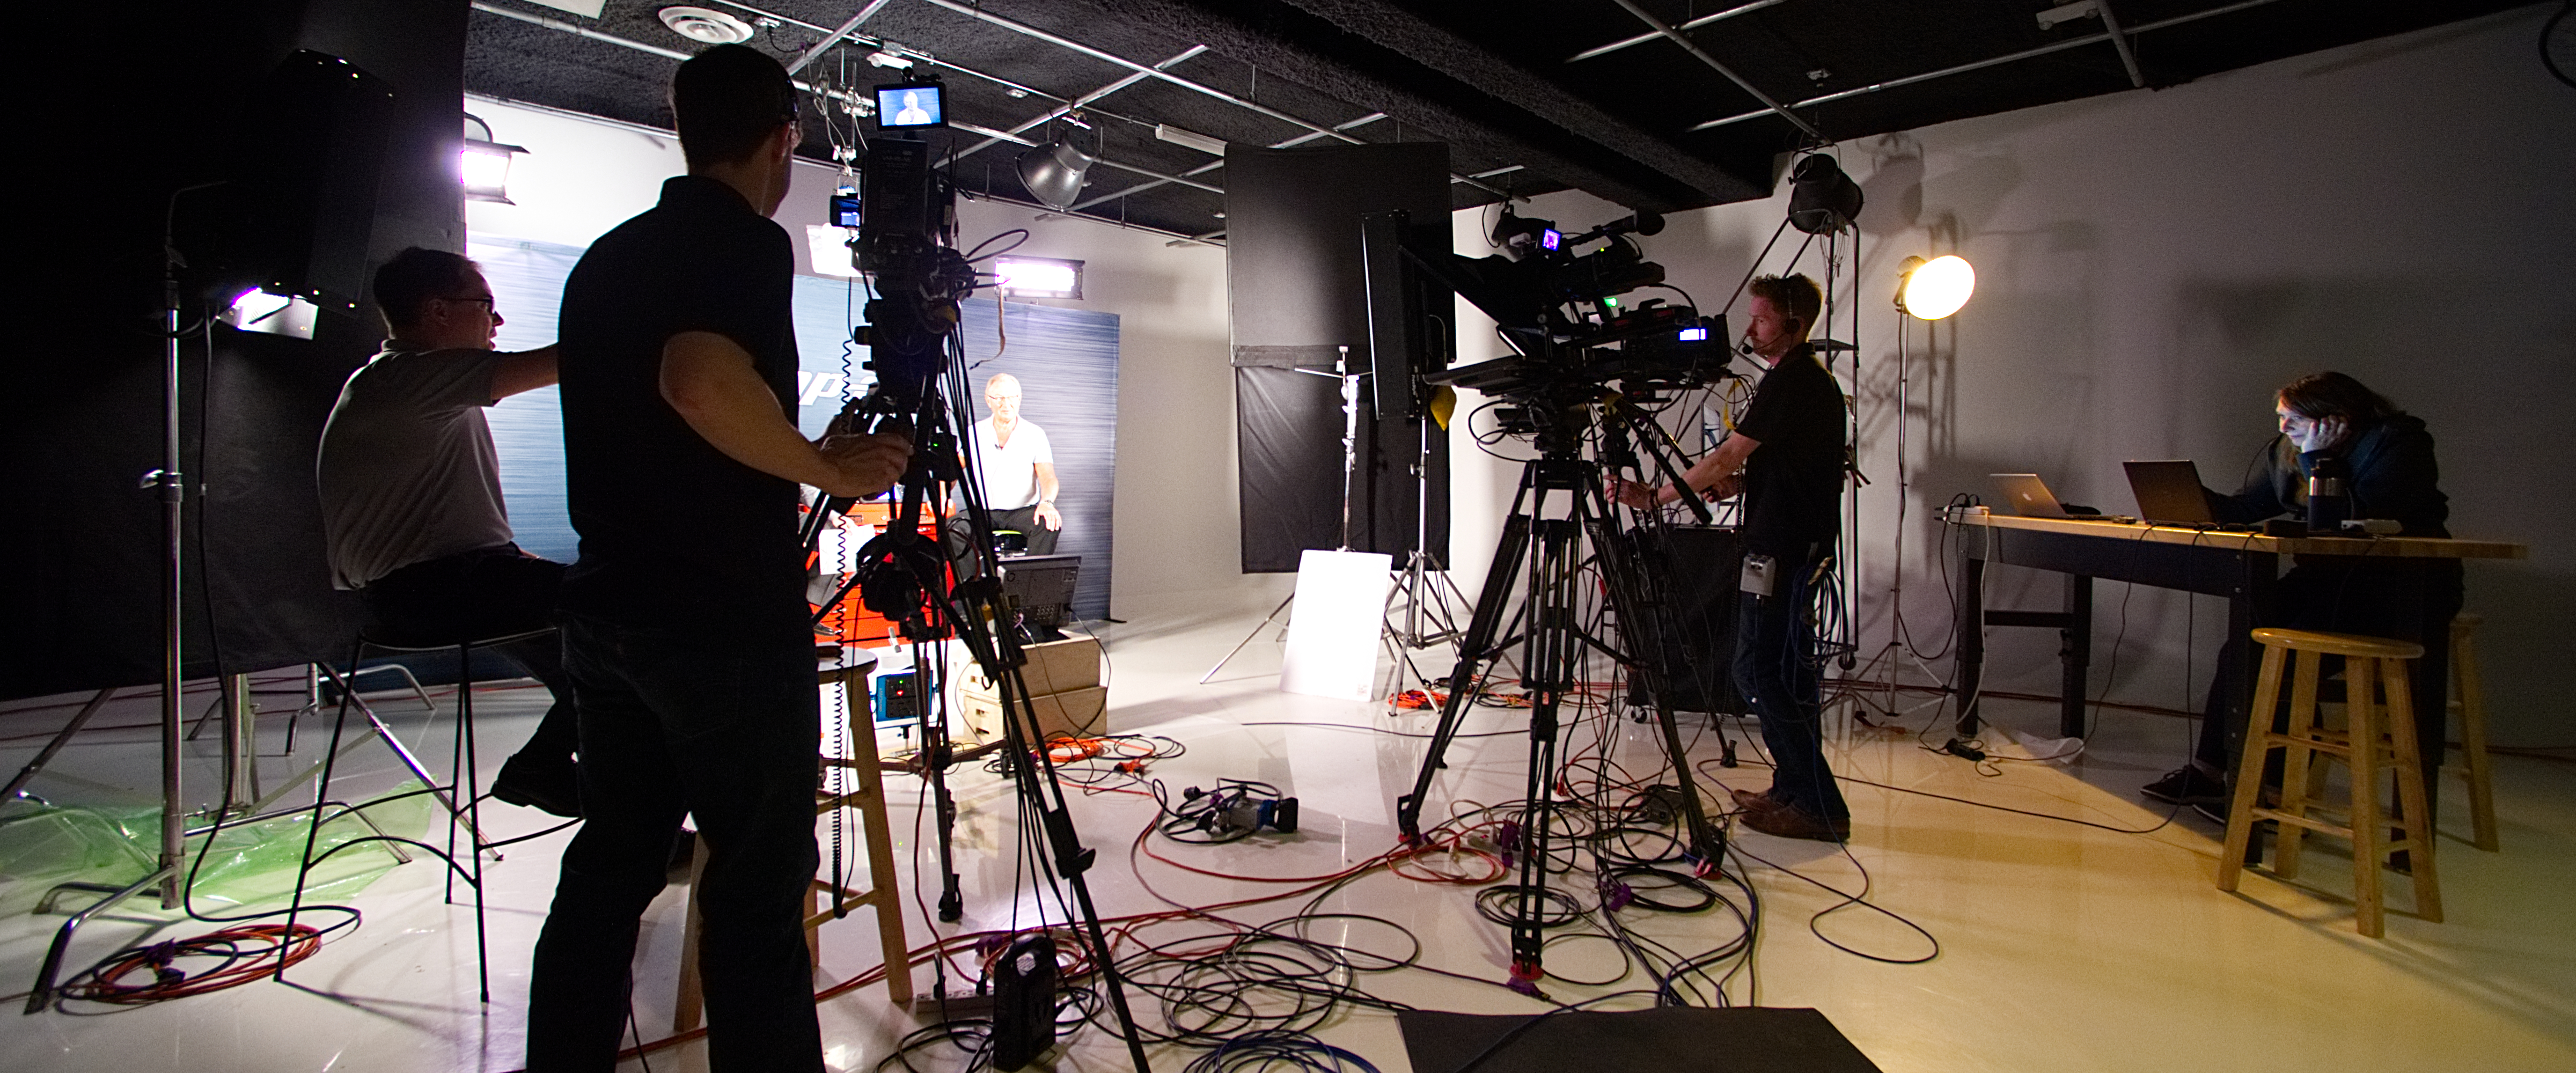 Live Streaming Studio Set Up